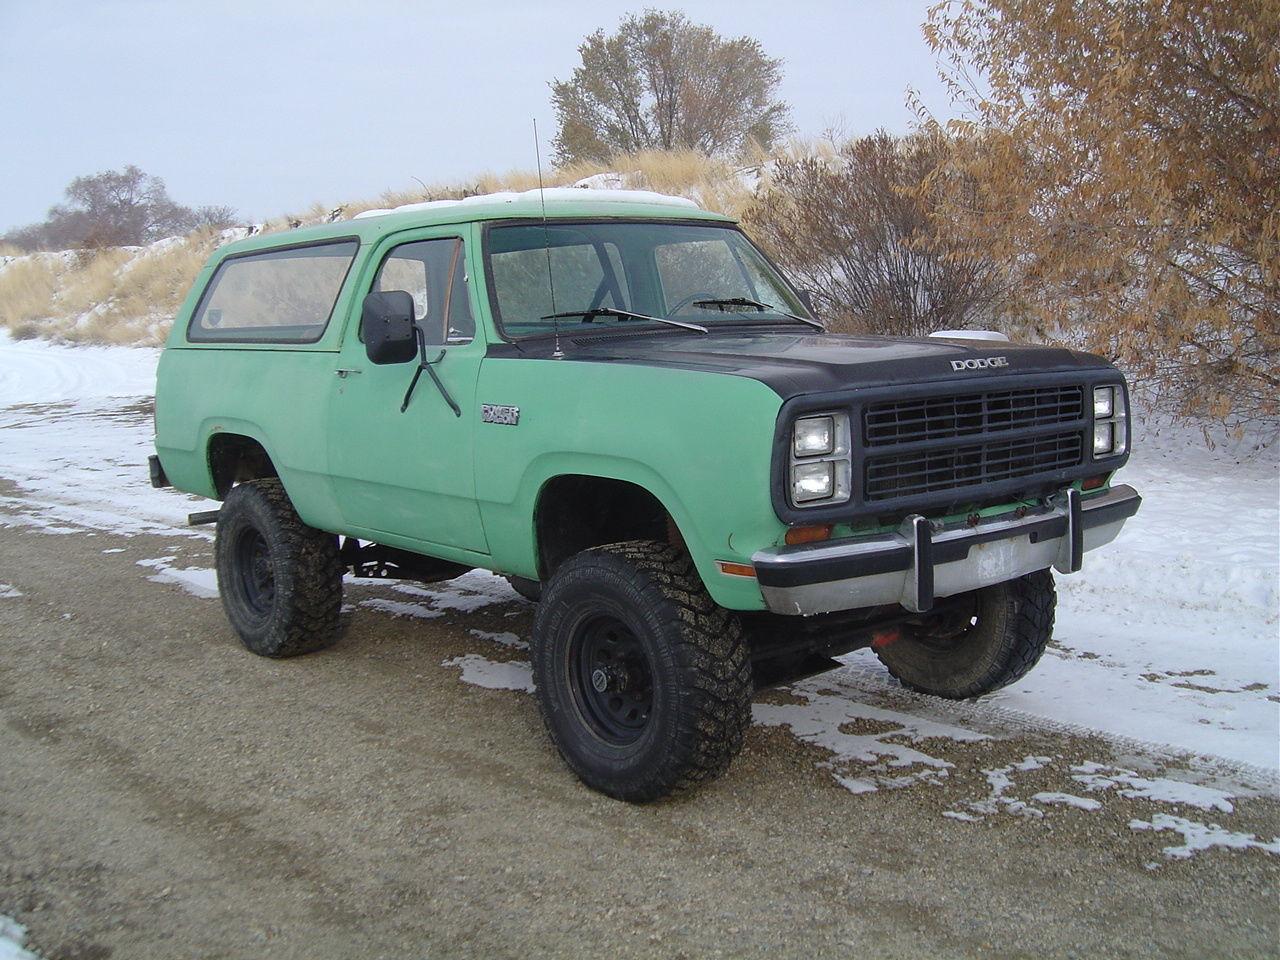 Optima Battery Charger >> 1980 Dodge Ramcharger Convertible HT..Big Block..4spd..Dana60's w/Lockers..Mopar - Classic Dodge ...